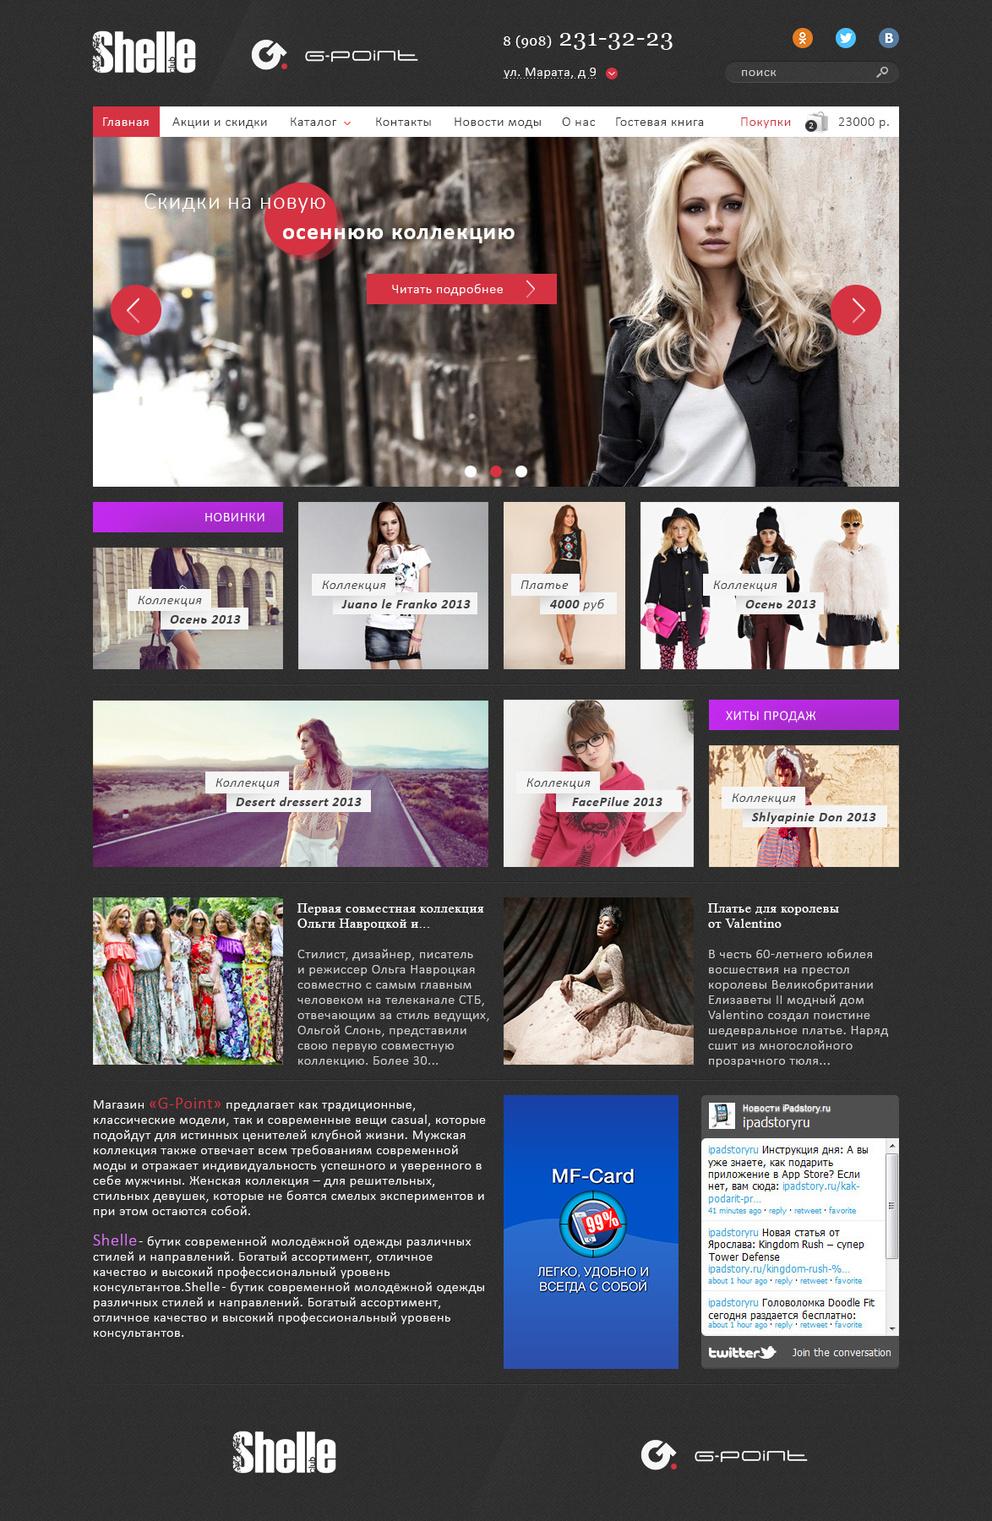 Shelle - интернет-каталог модной одежды / Проект компании ArtCell Group